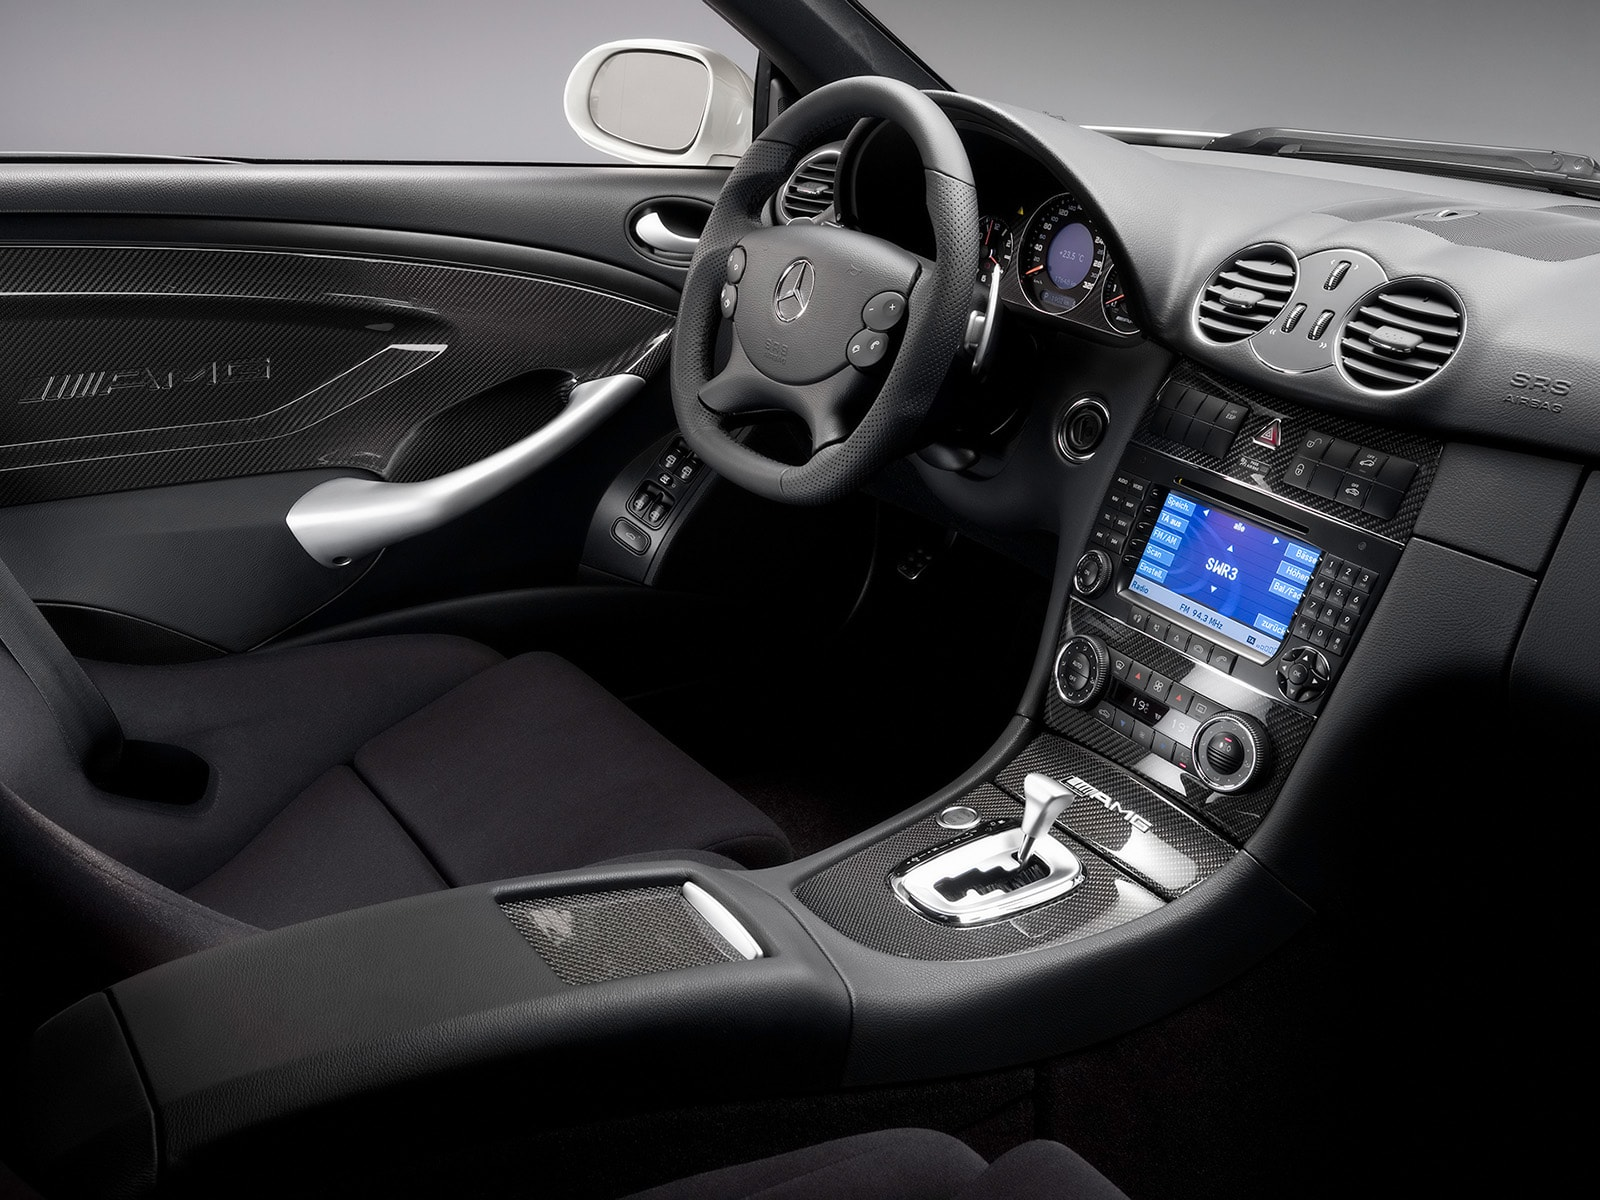 2008 Mercedes-Benz CLK63 AMG Black Series Full hd wallpapers